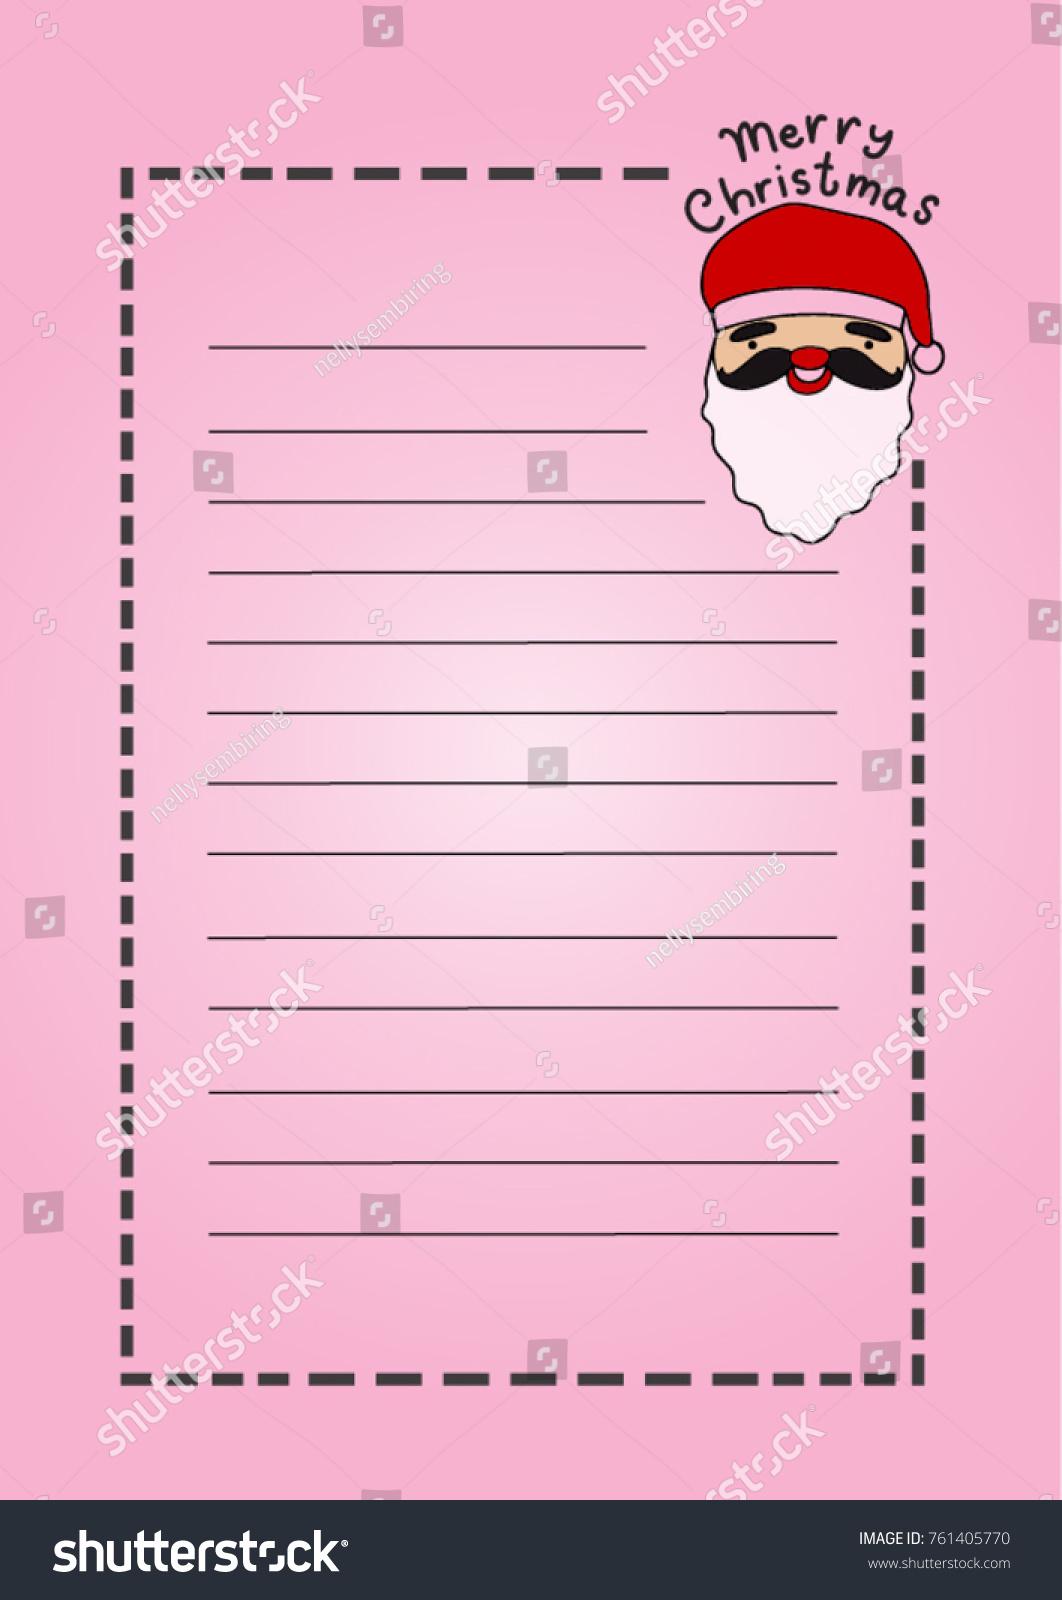 Printable Letter Pad Christmas Stationery Santa Stock Vector ...